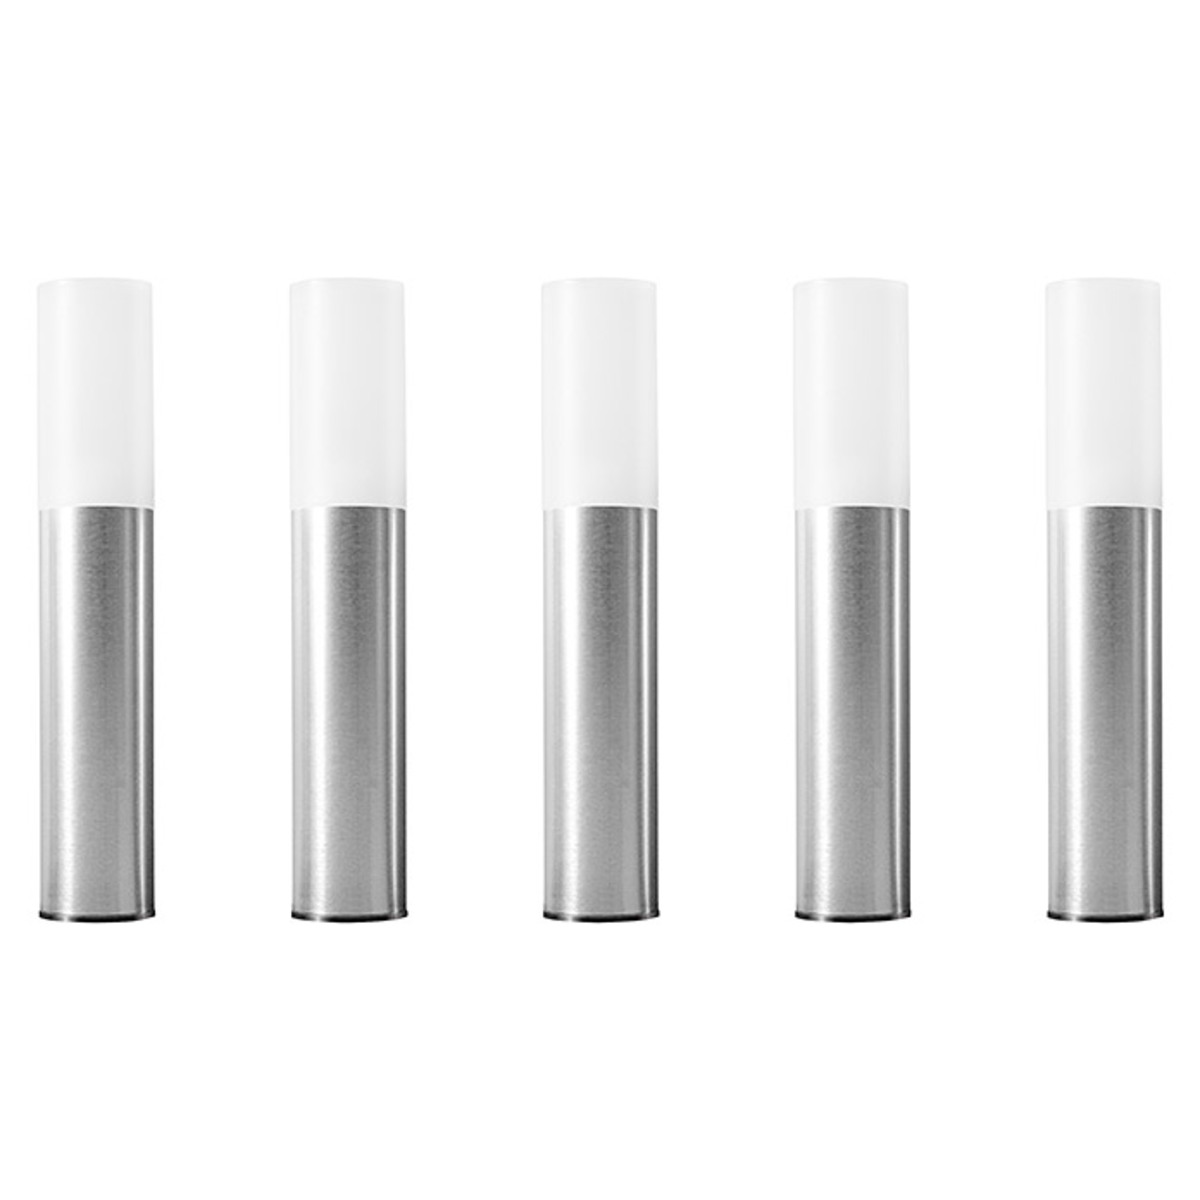 Bild 2 von Osram Smart+ ZigBee LED-Gartenspot-Set Pole Mini